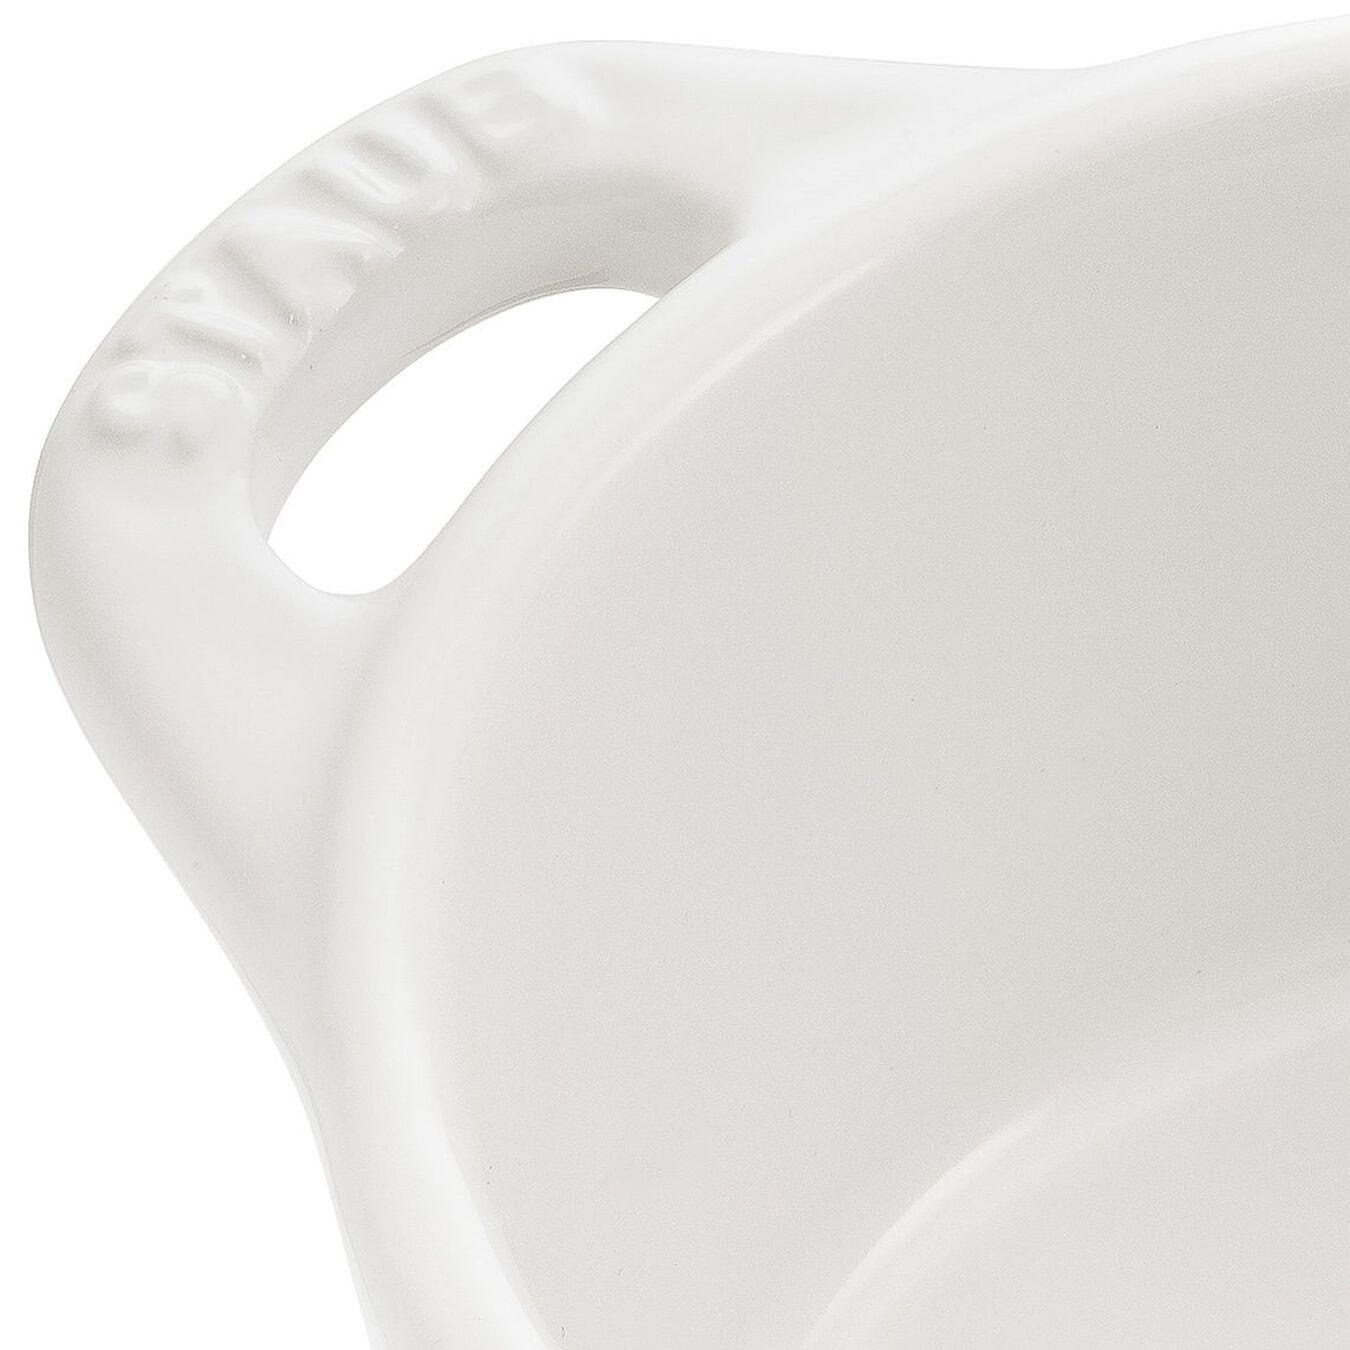 Mini Cocotte 10 cm, redondo, Branco puro, Cerâmica,,large 2